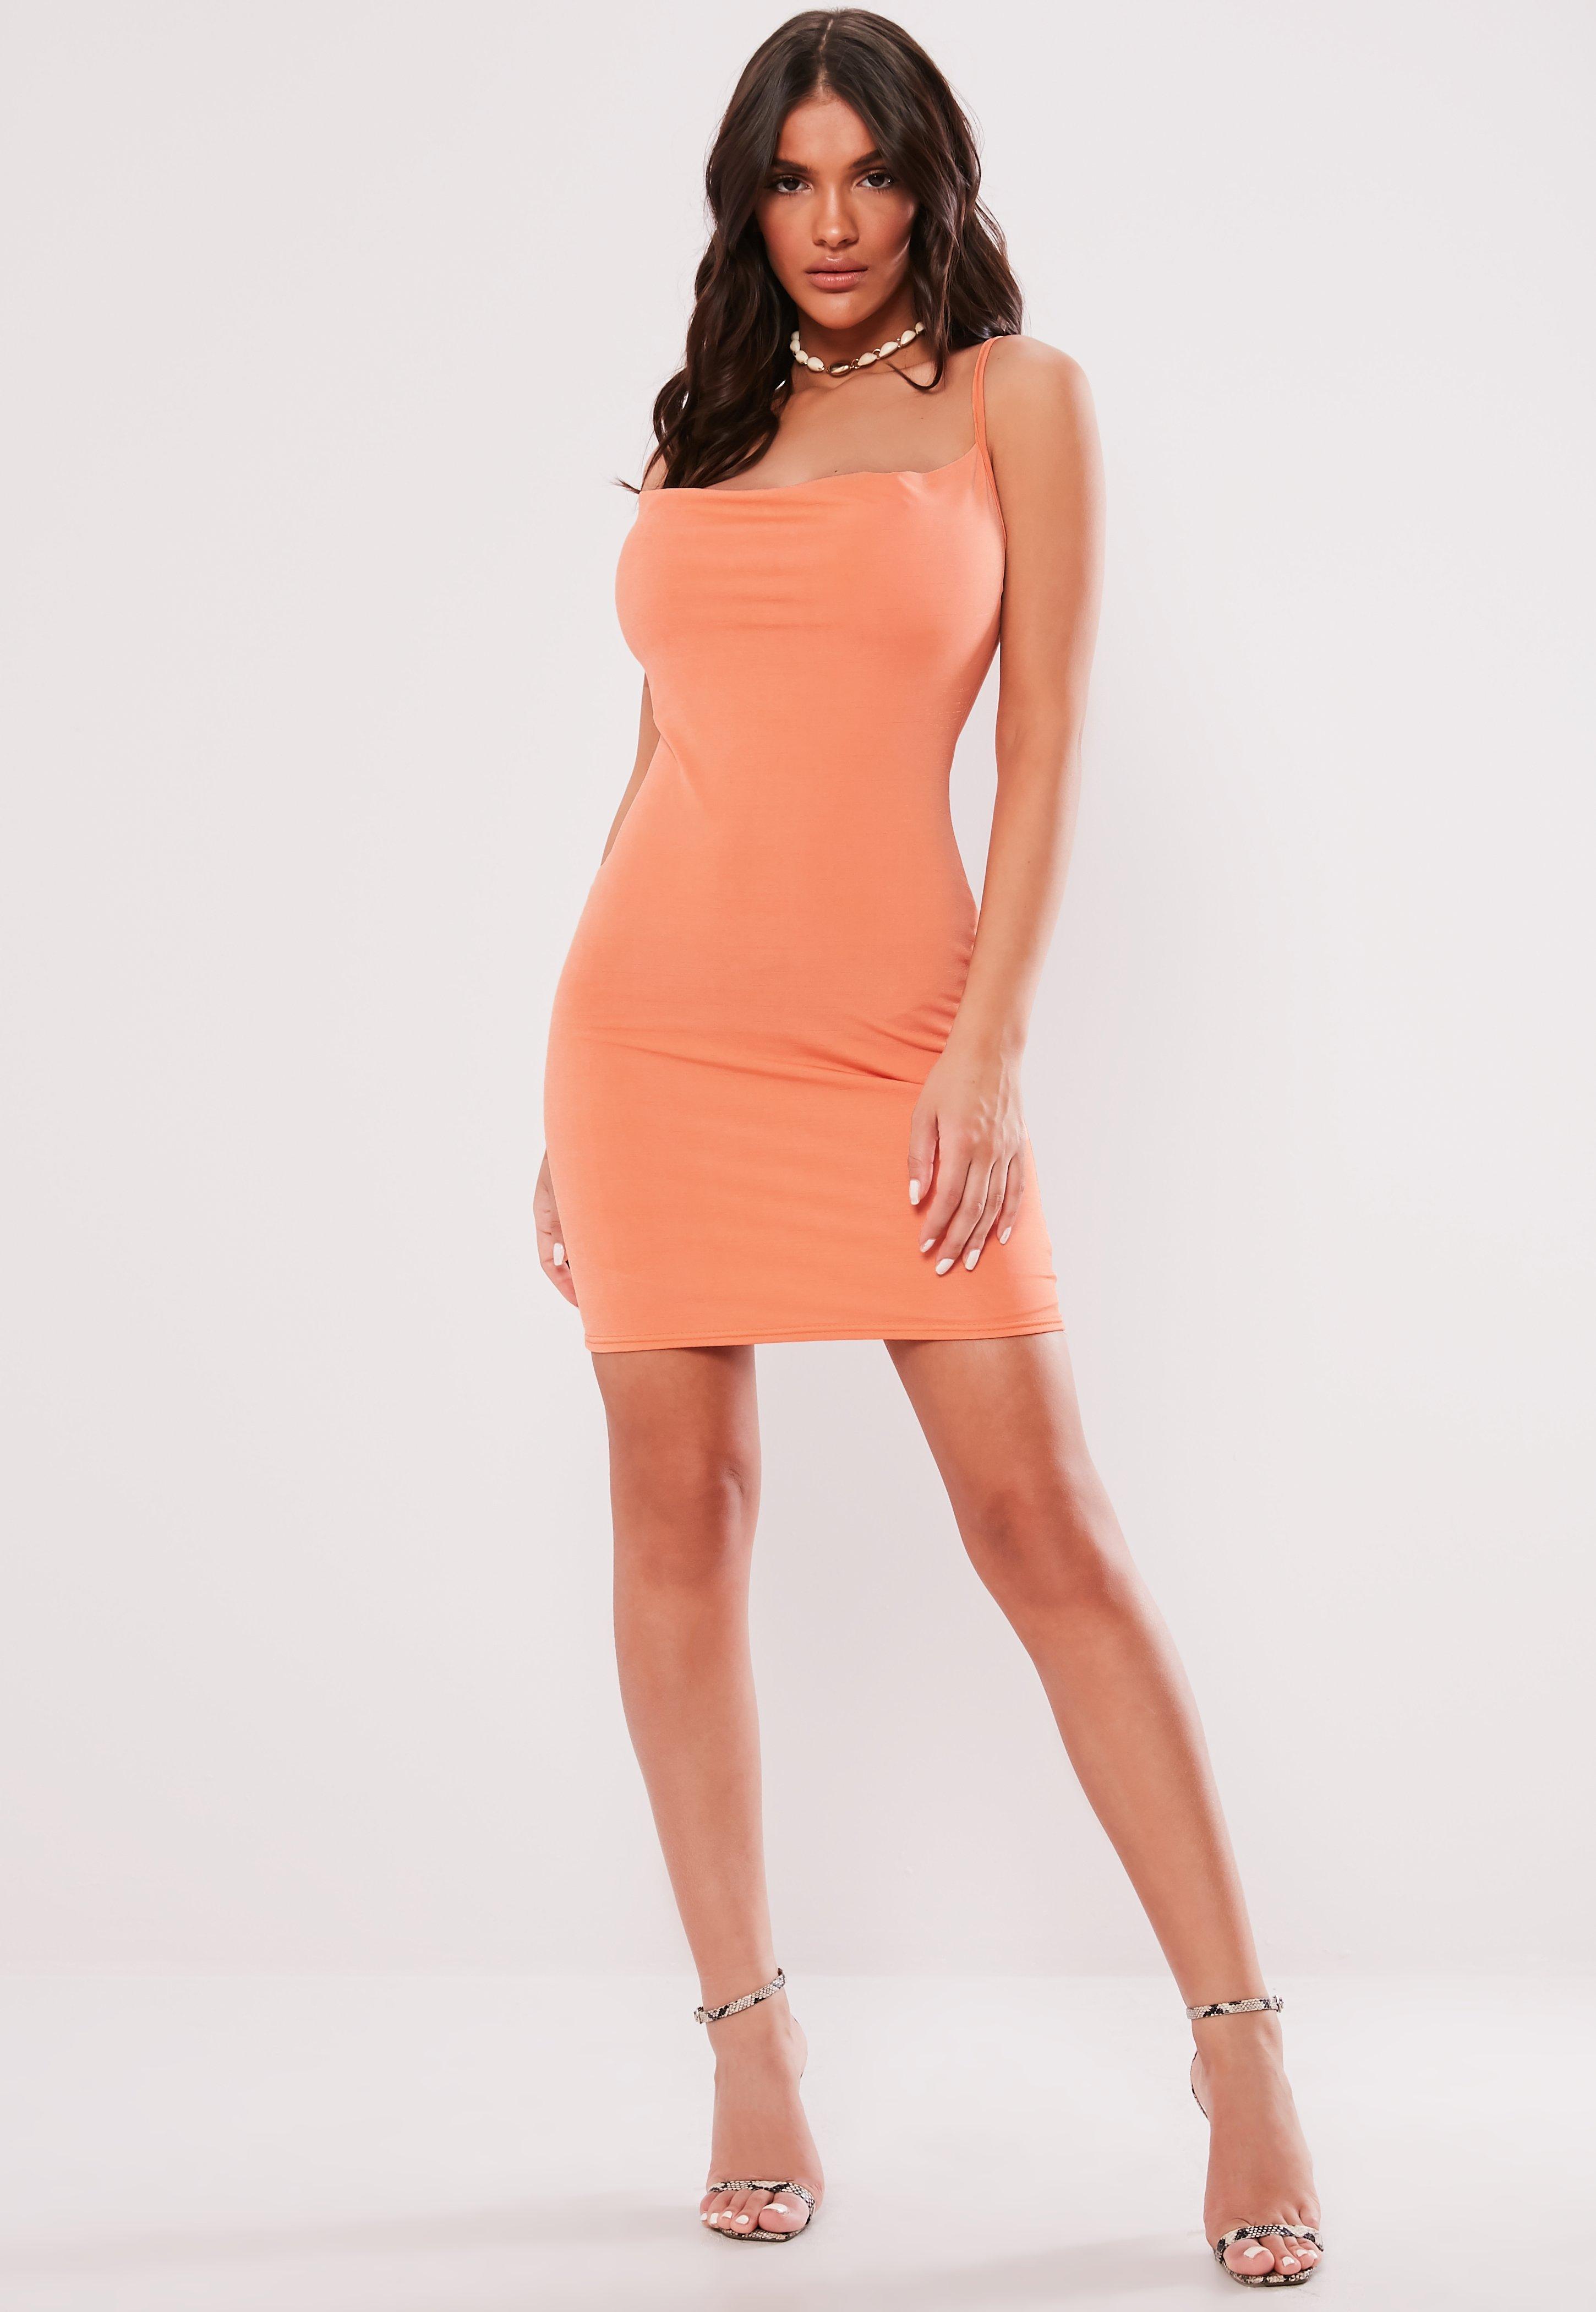 d3acade0ab51 Slip Dresses